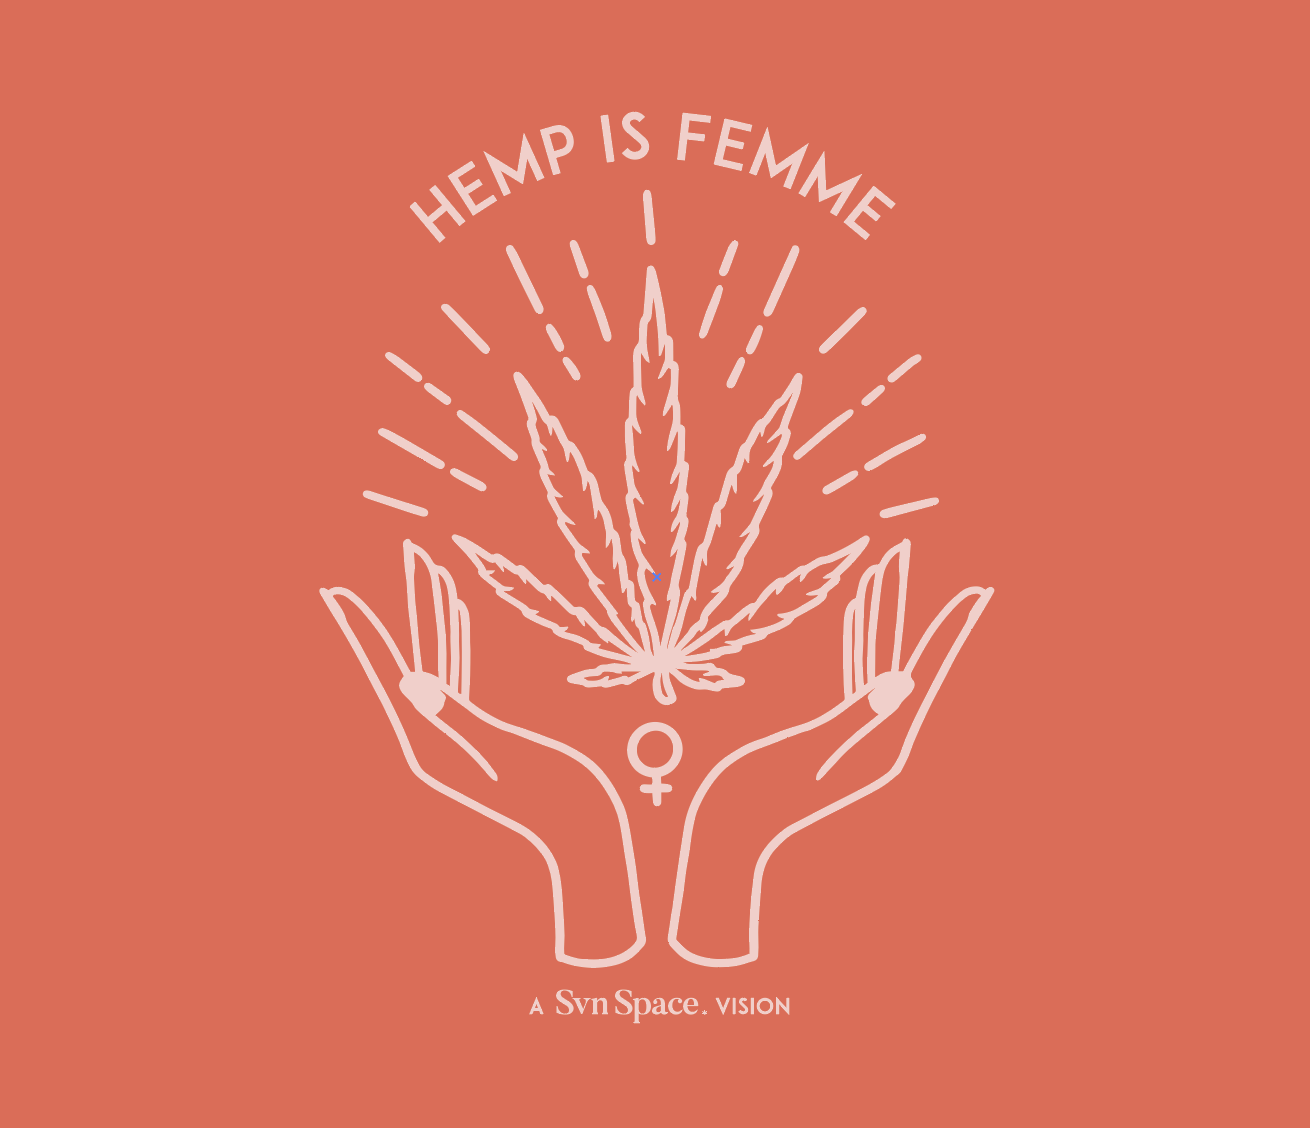 Hemp Is Femme Two Hands and Hemp Leaf